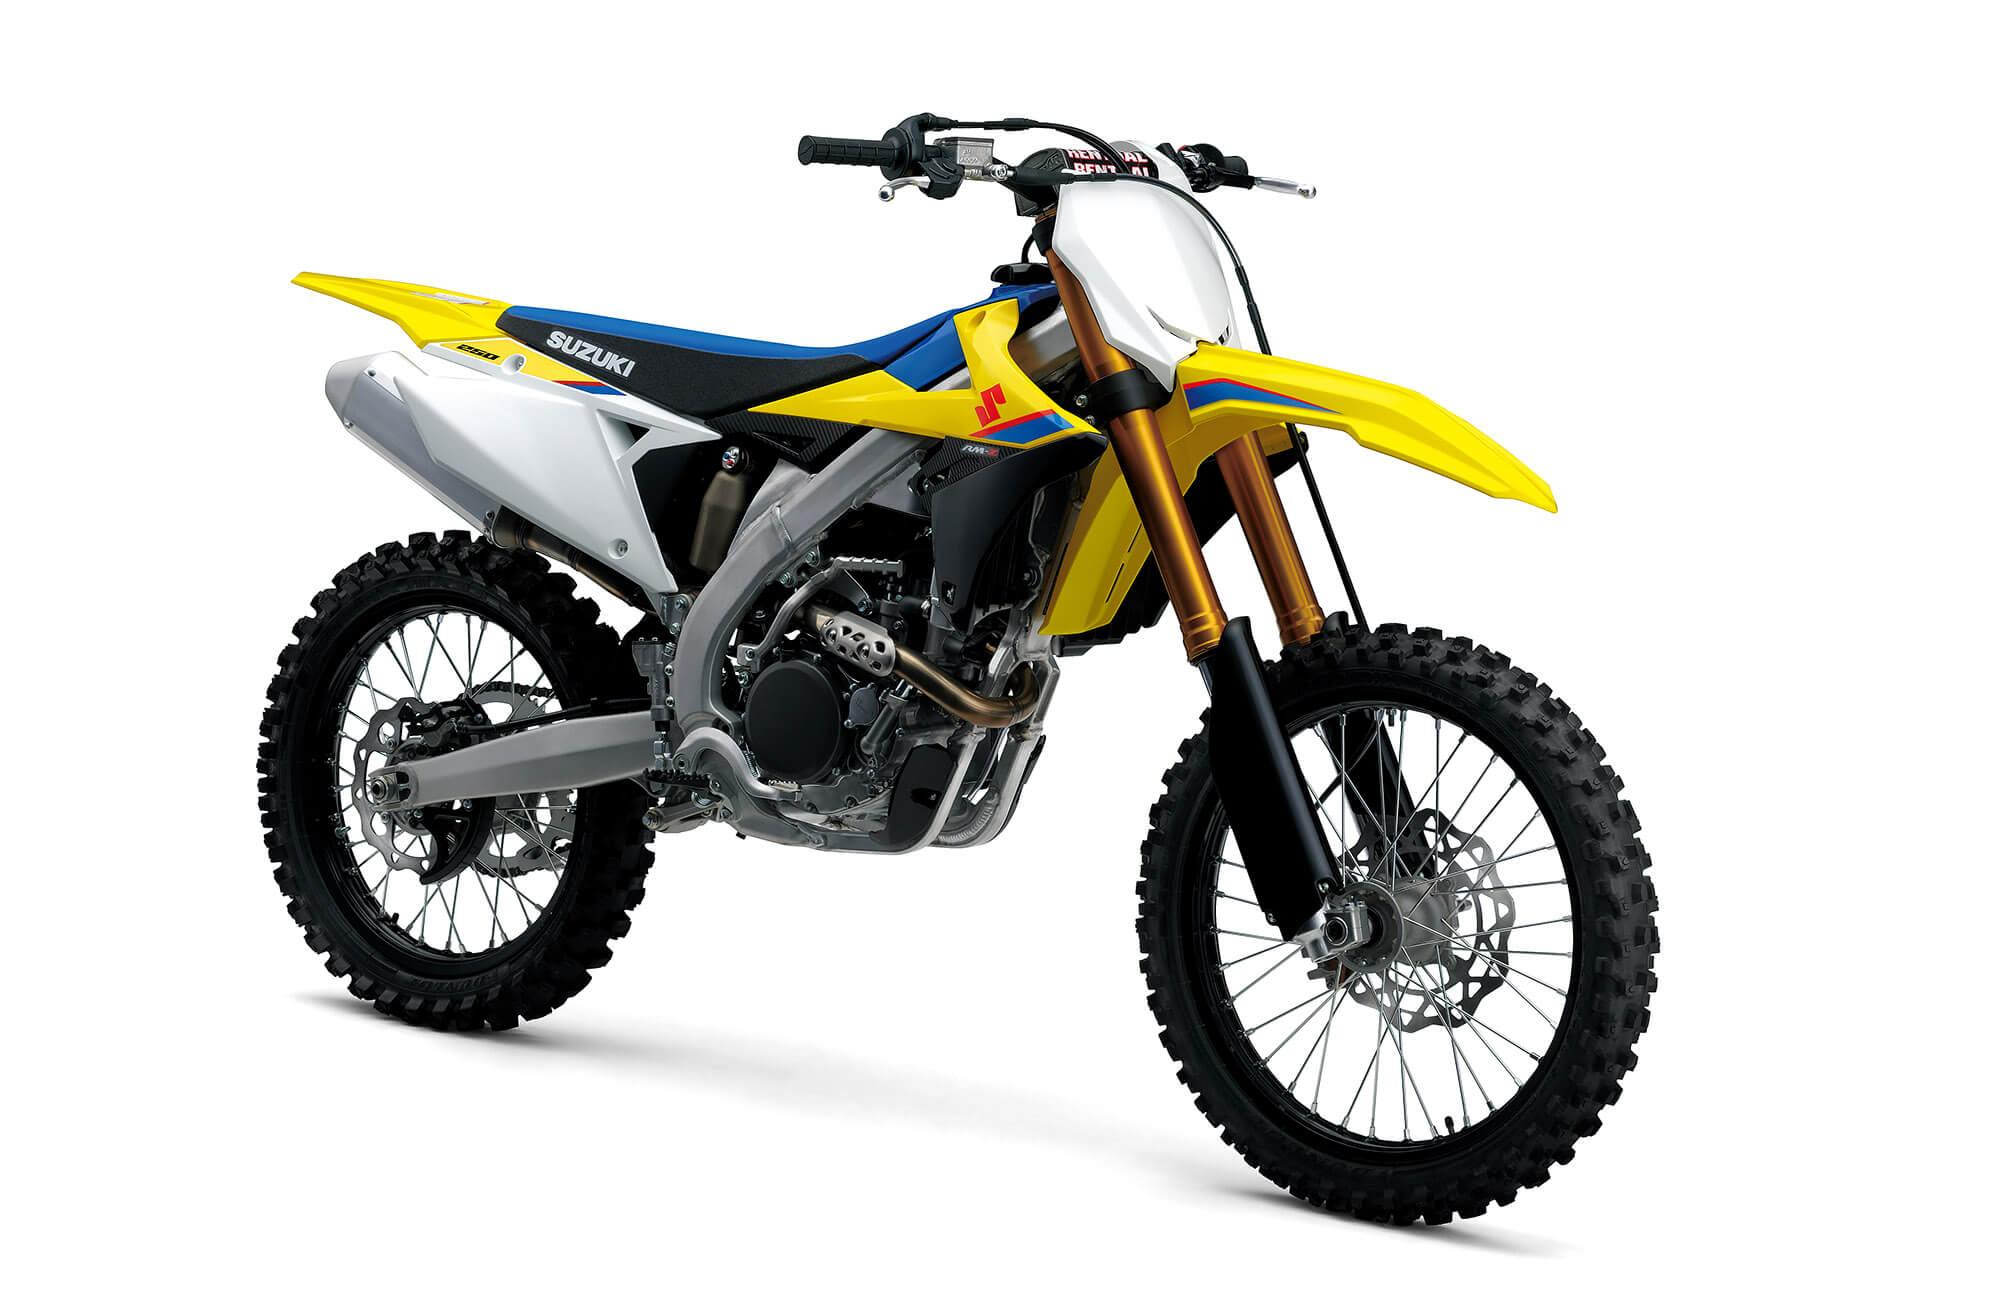 2019-RM-Z250-yellow-black